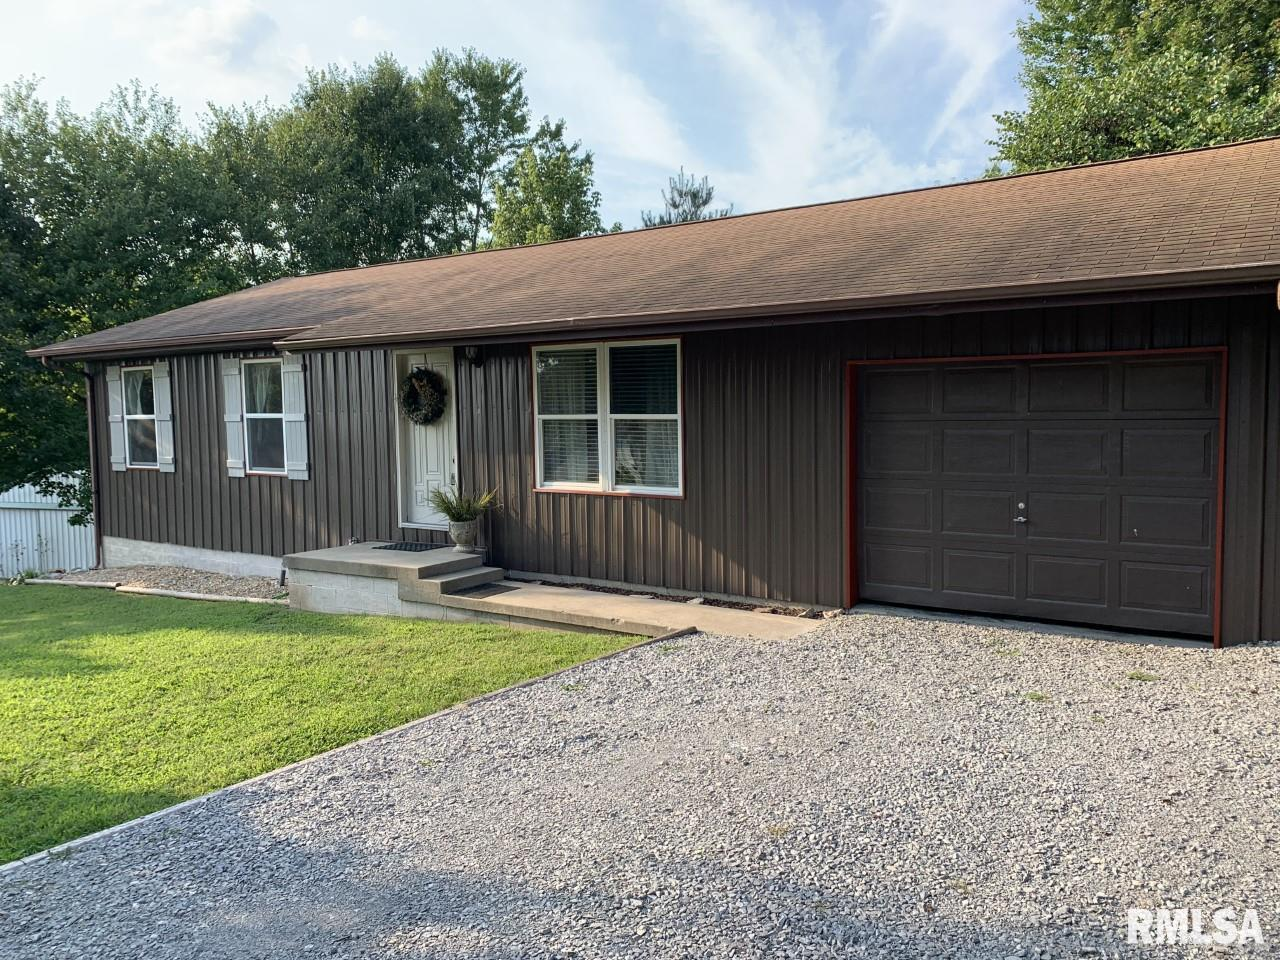 106 VIRGINIA Property Photo - Jonesboro, IL real estate listing